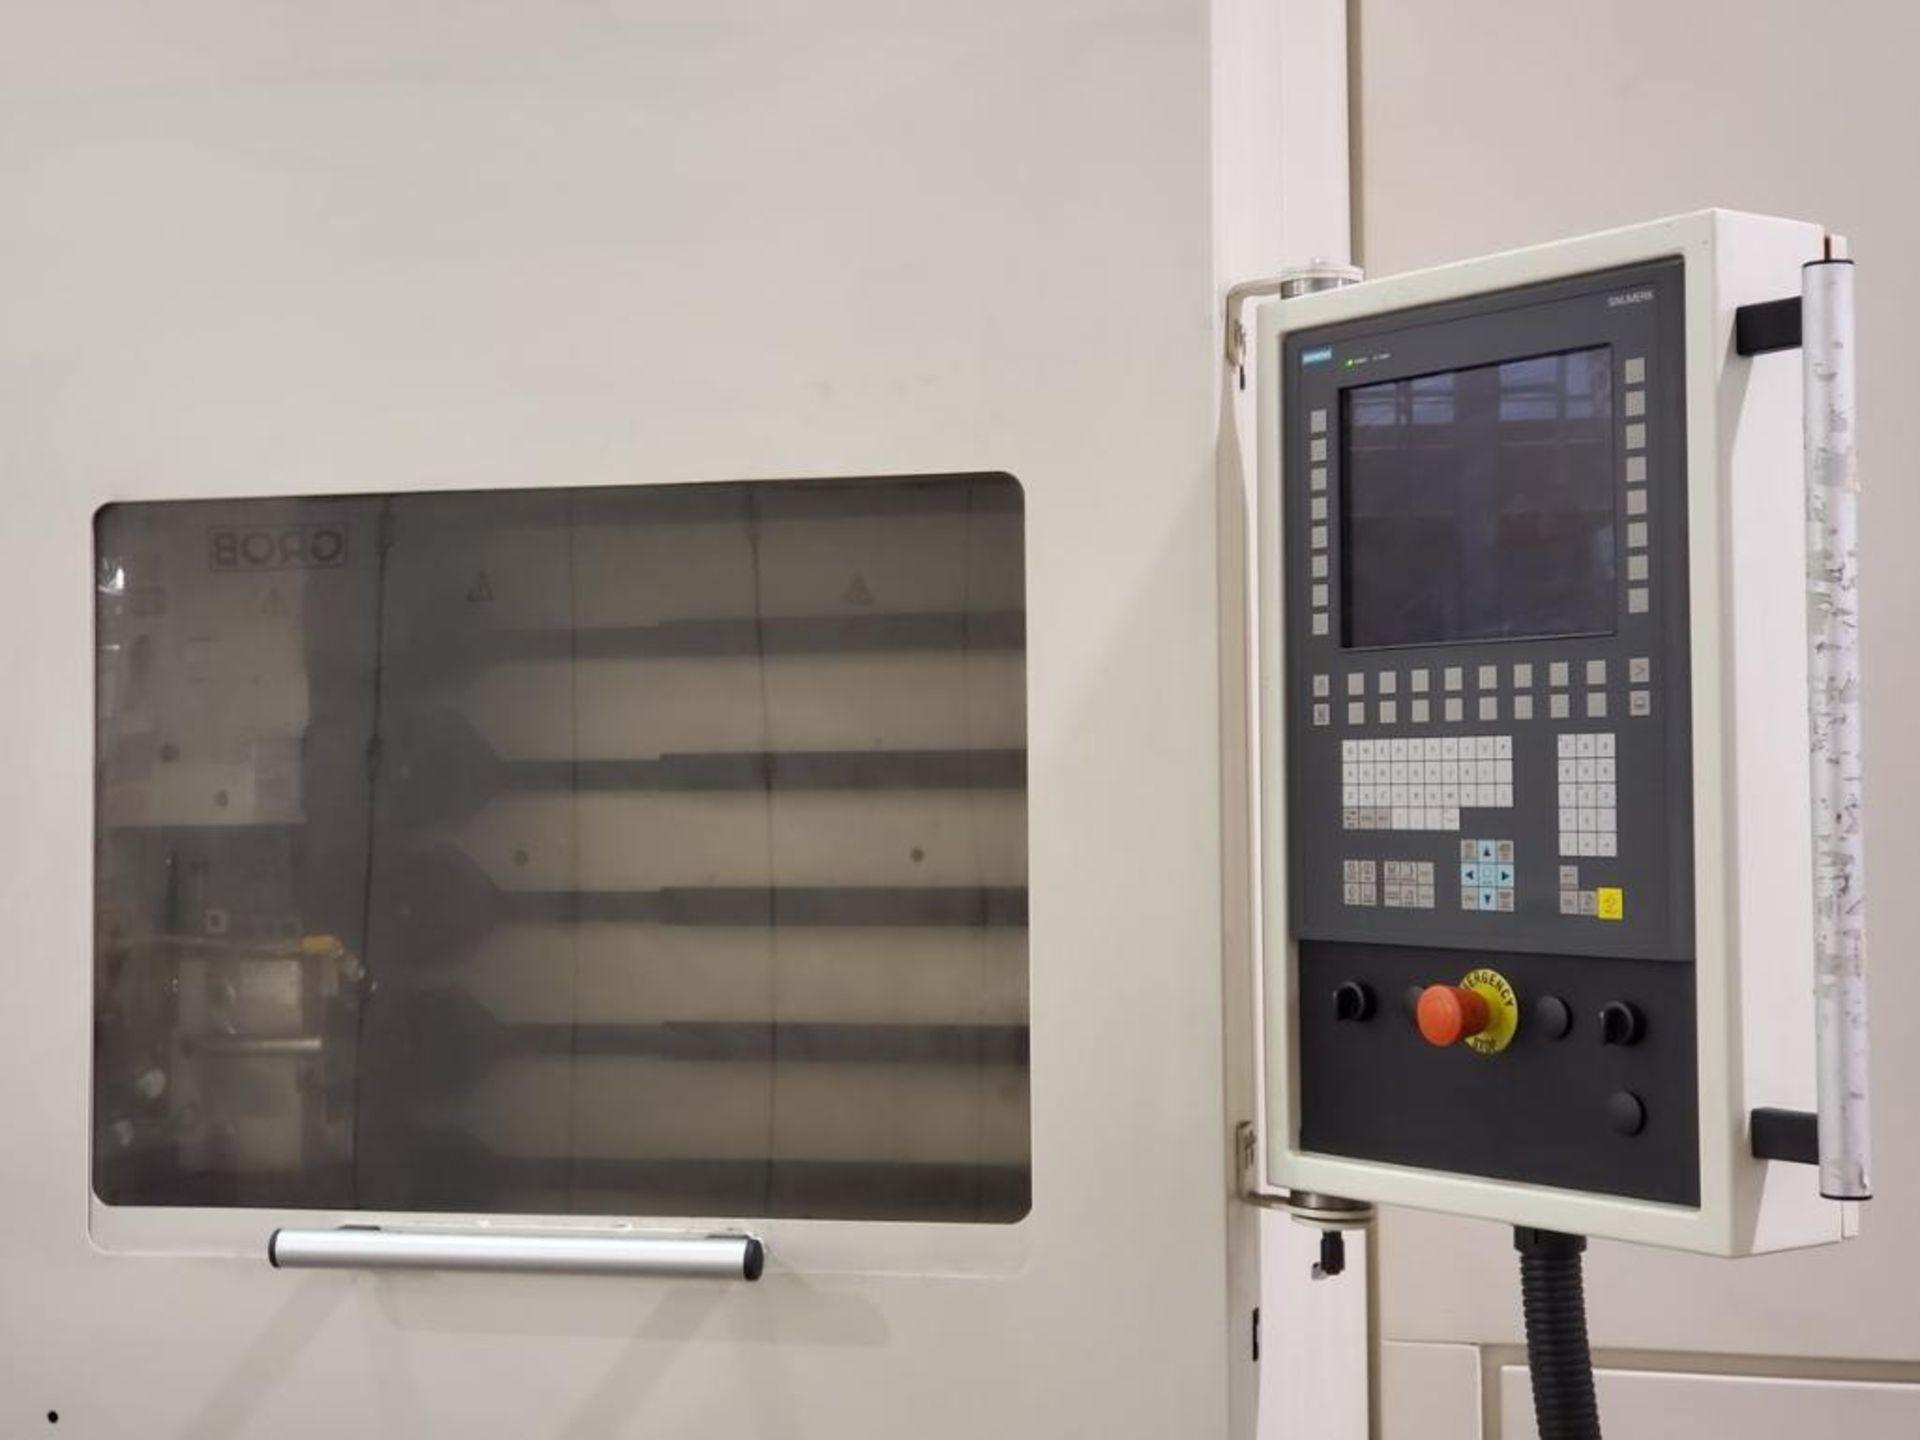 Lot 5 - 2011 Heller MCH 400 PC, Horizontal Machining Center